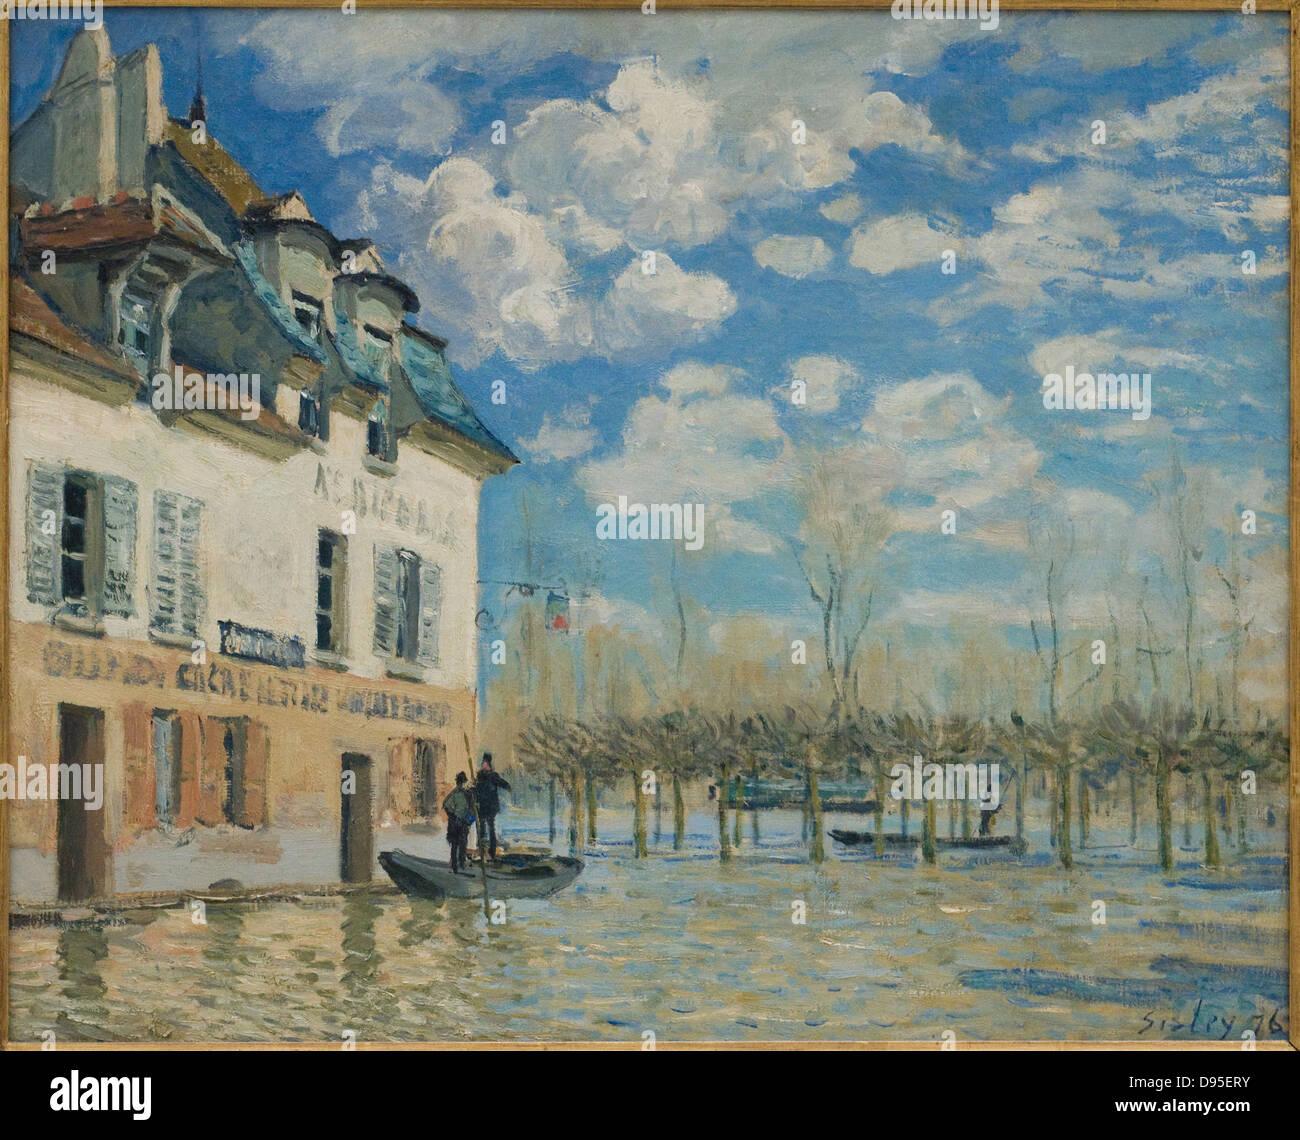 Alfred Sisley La barque pendant l'inondation, Port-Marly 1876 XIX th century Orsay Museum - Paris - Stock Image